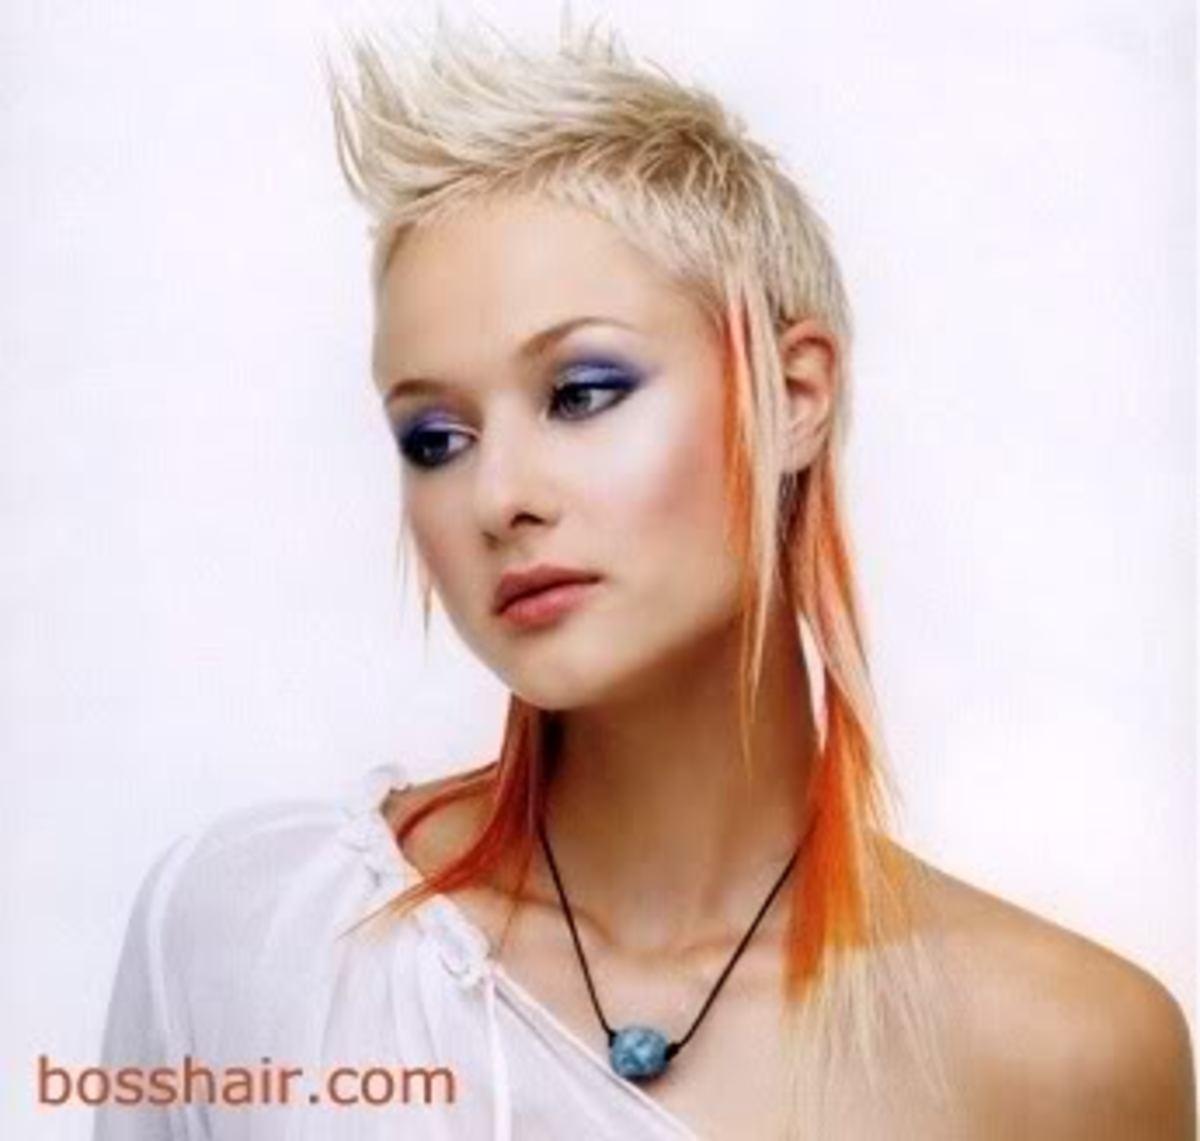 http://media.photobucket.com/image/punk+hair/pinkiacid/